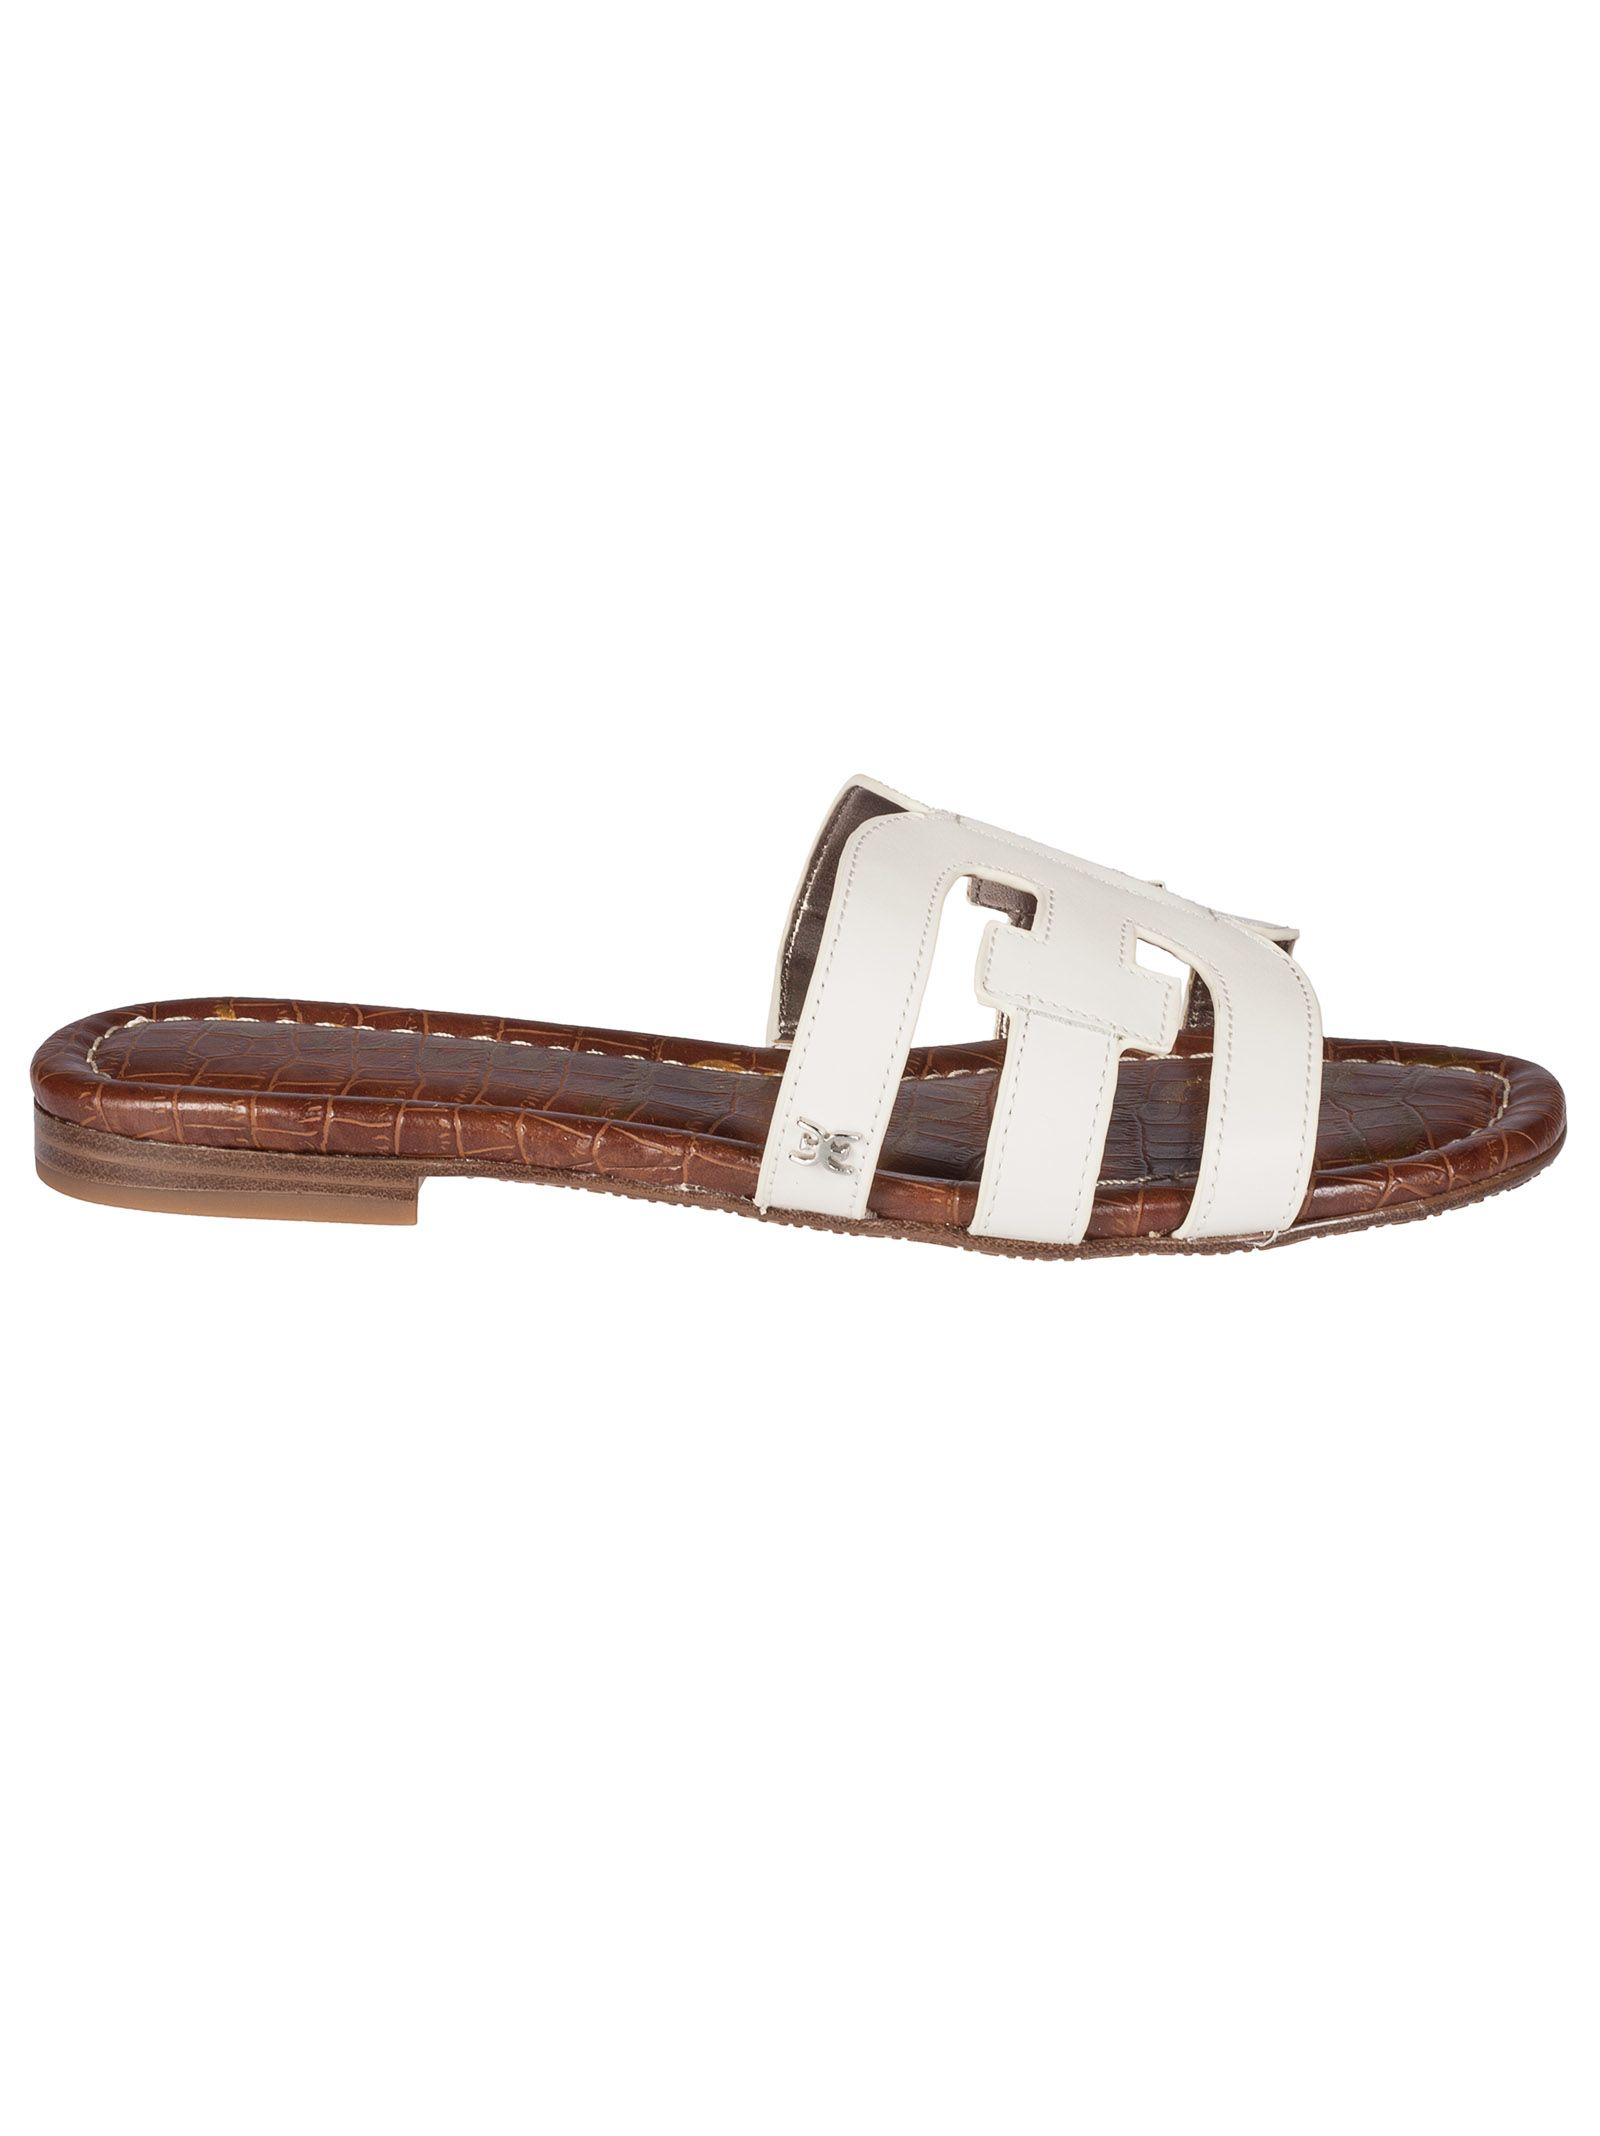 08940231fe915 Sam Edelman Sam Edelman Bay Double E Sandals - White - 10842505 ...